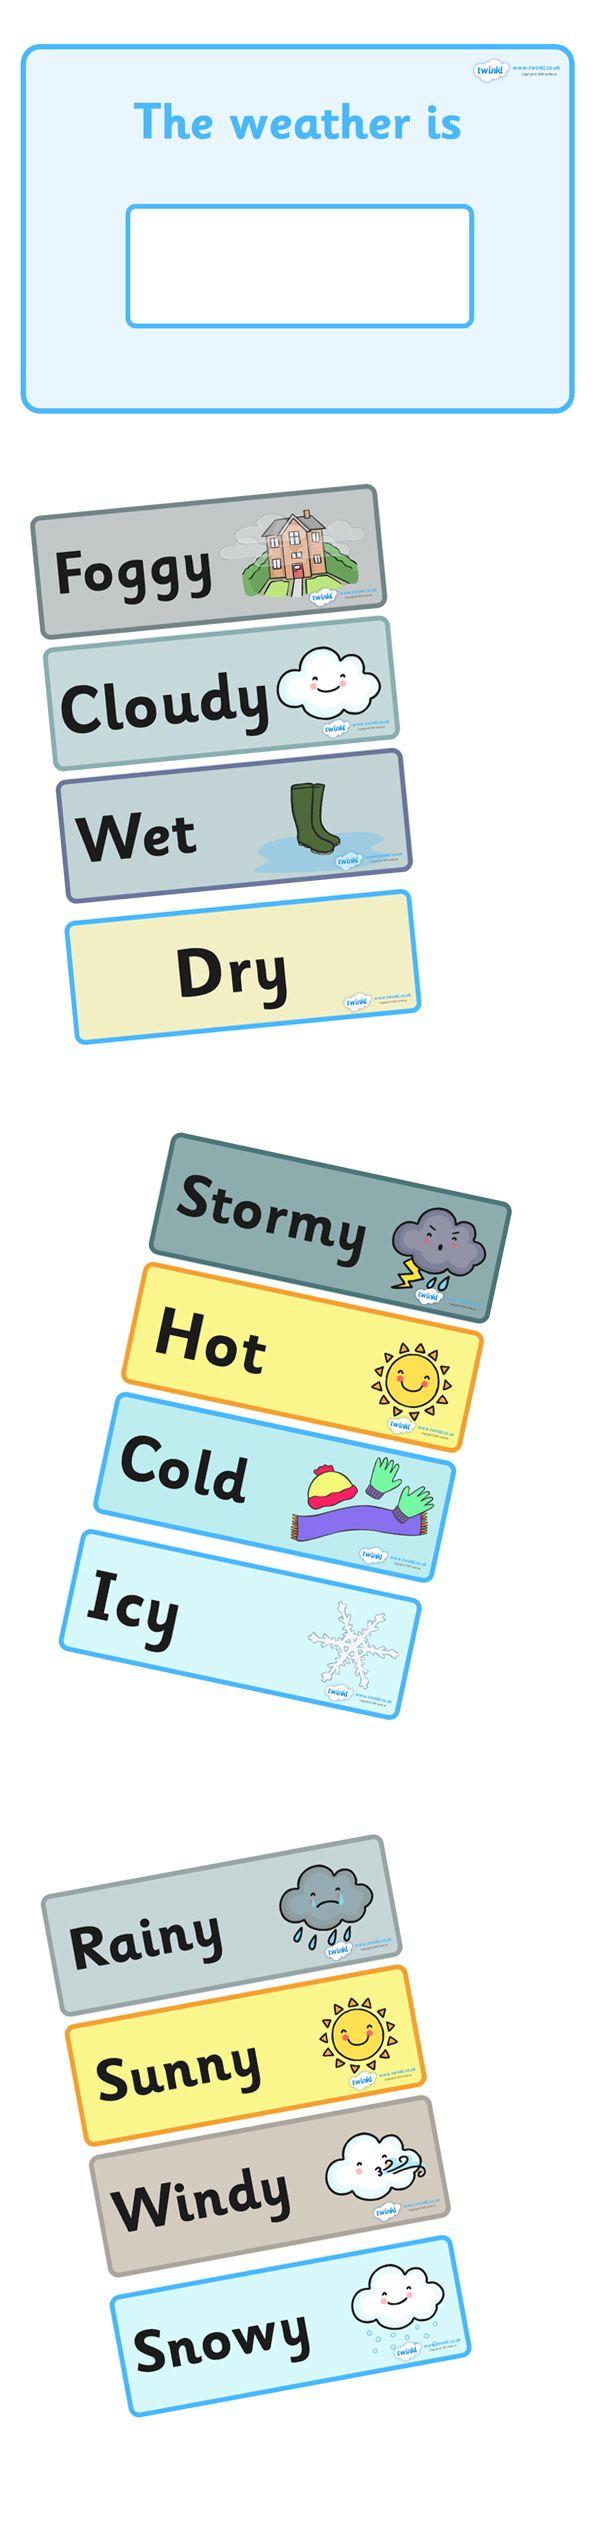 twinkl resources weather display classroom printables for pre school kindergarten. Black Bedroom Furniture Sets. Home Design Ideas